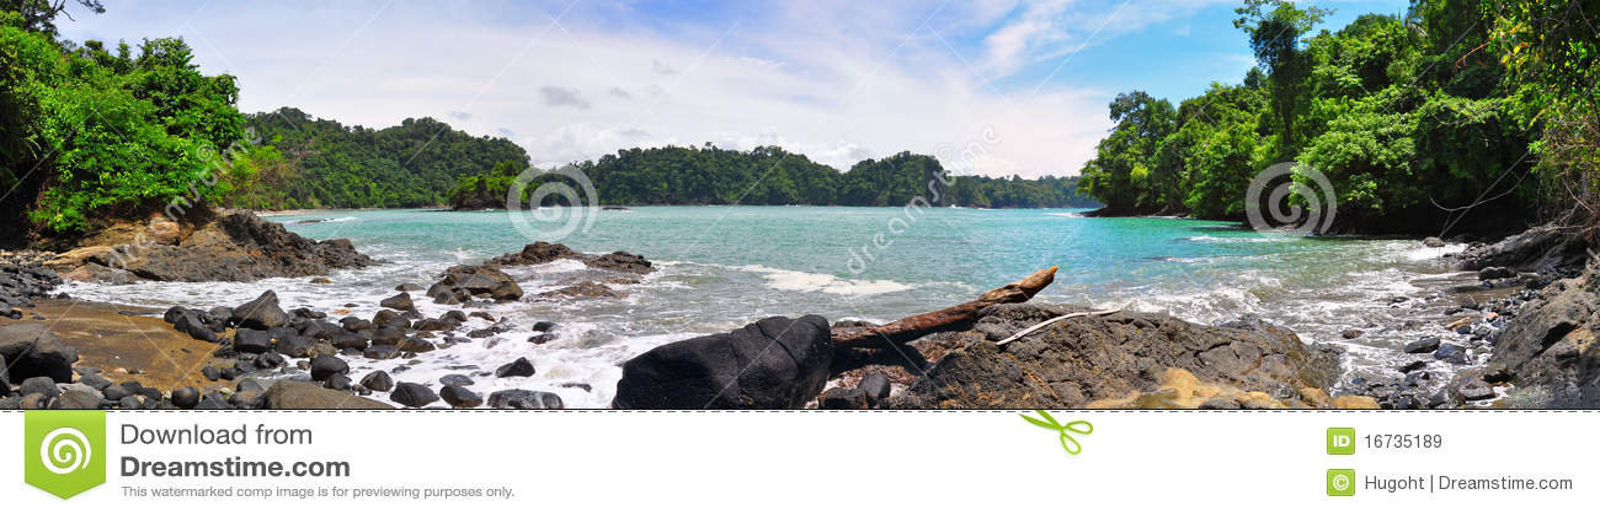 Manuel Antonio Strand, Costa Rica